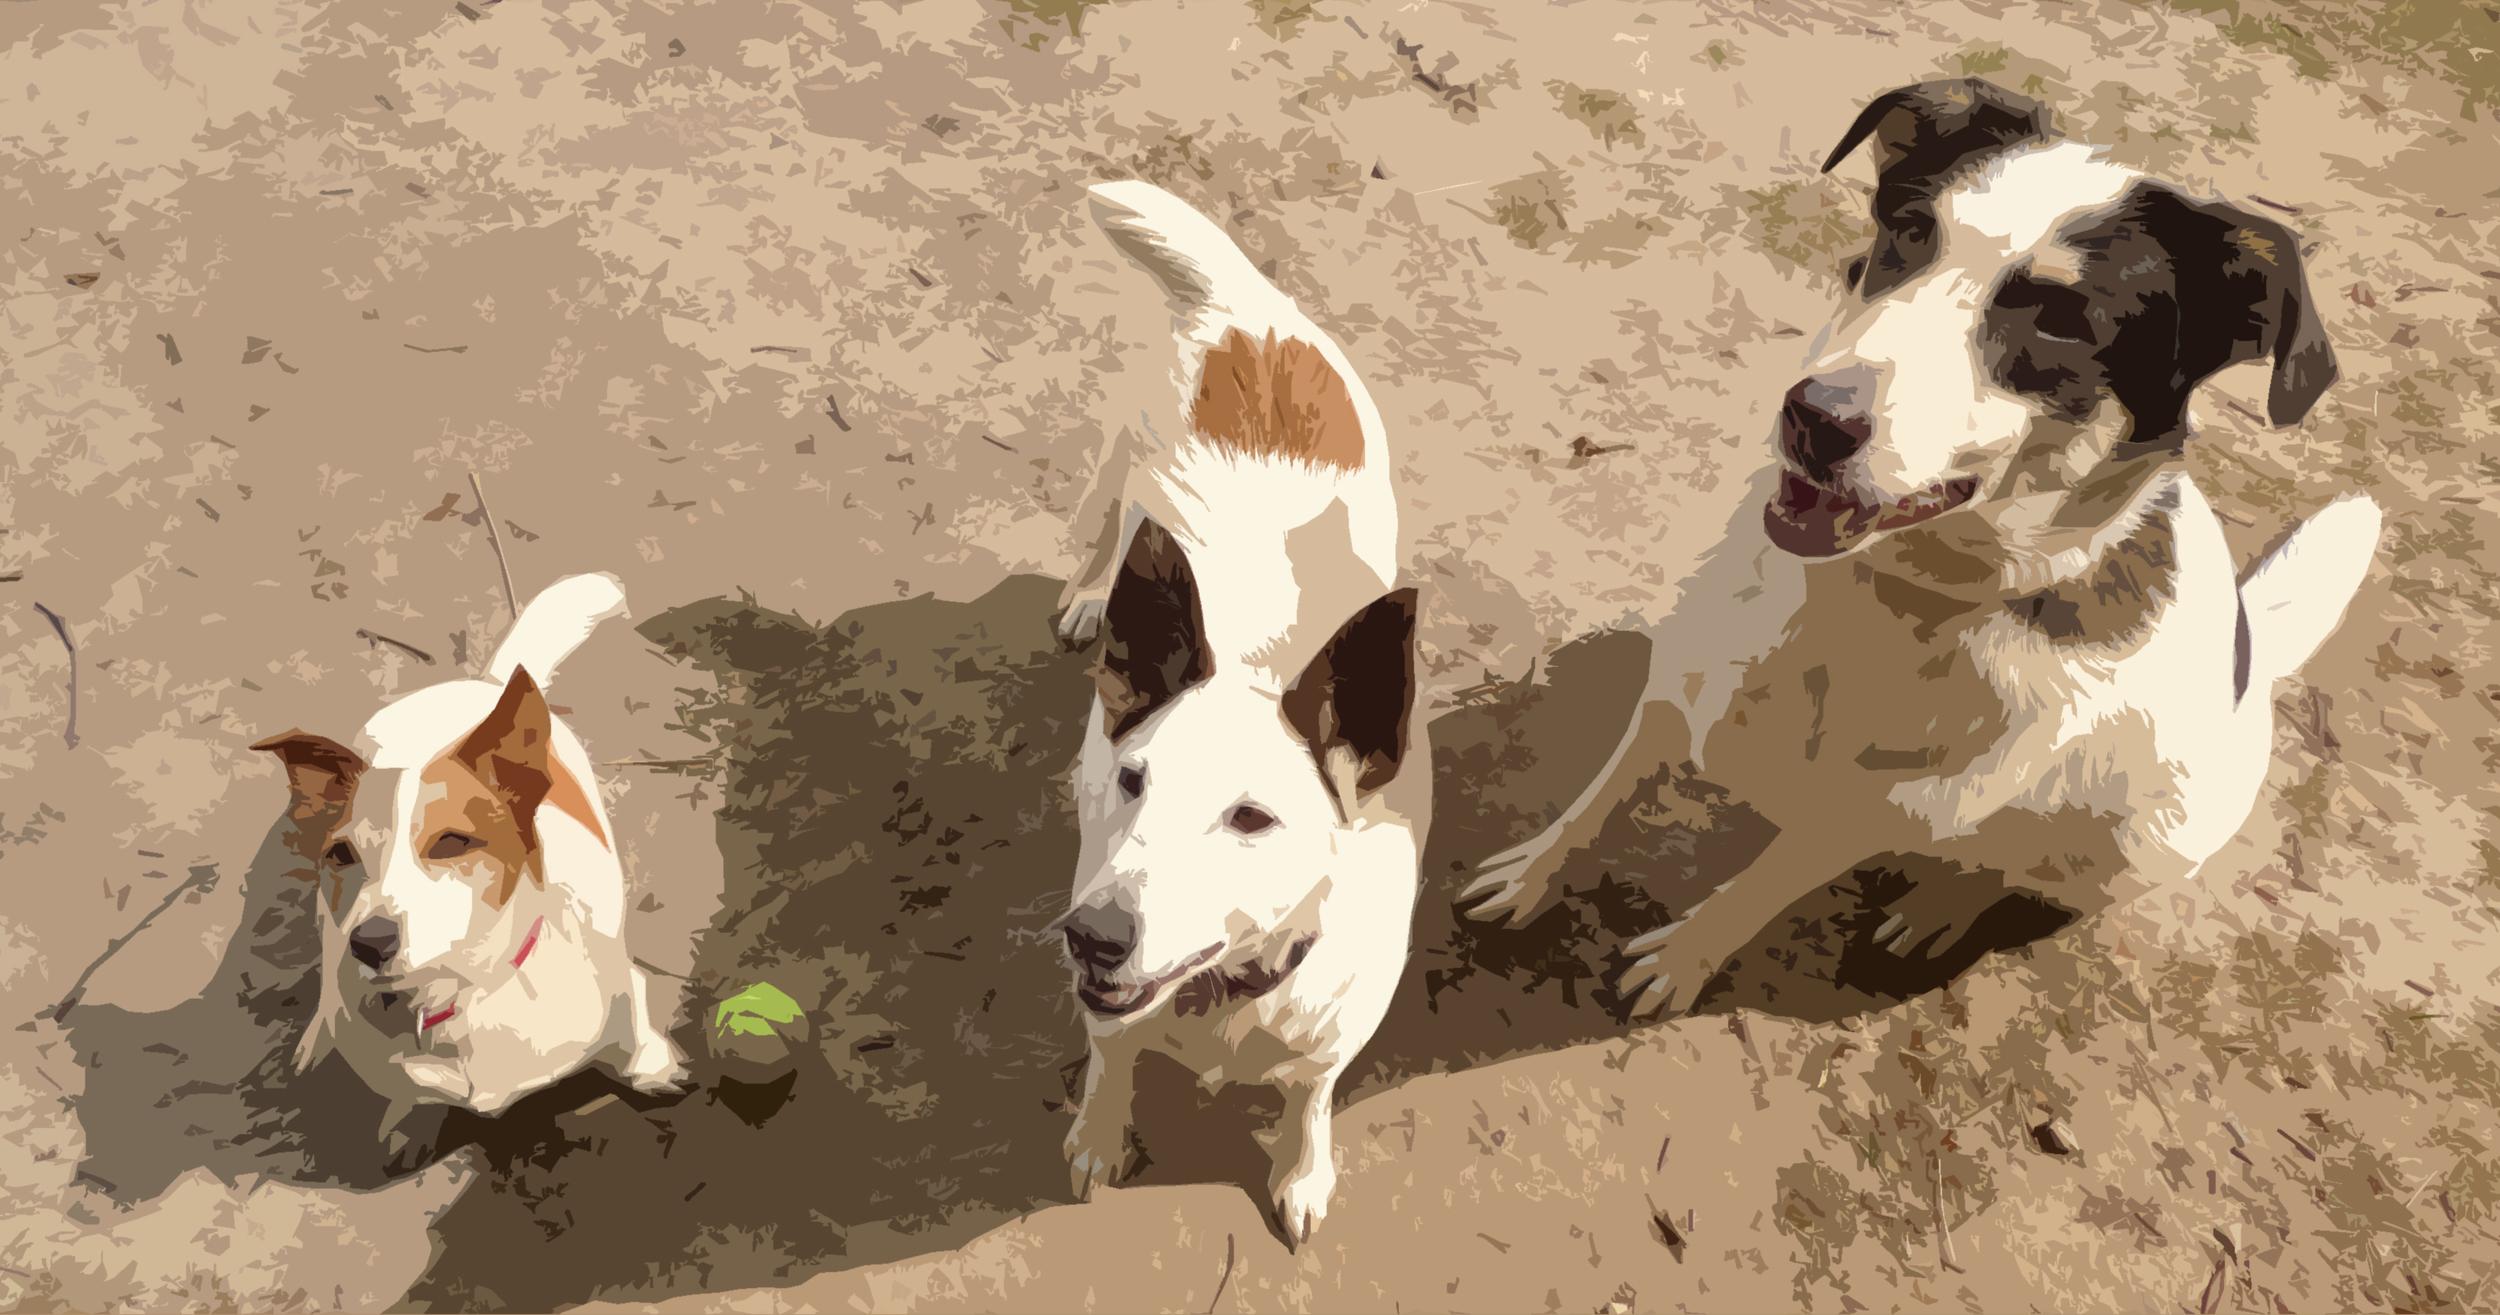 cutout 3 dogs.jpg